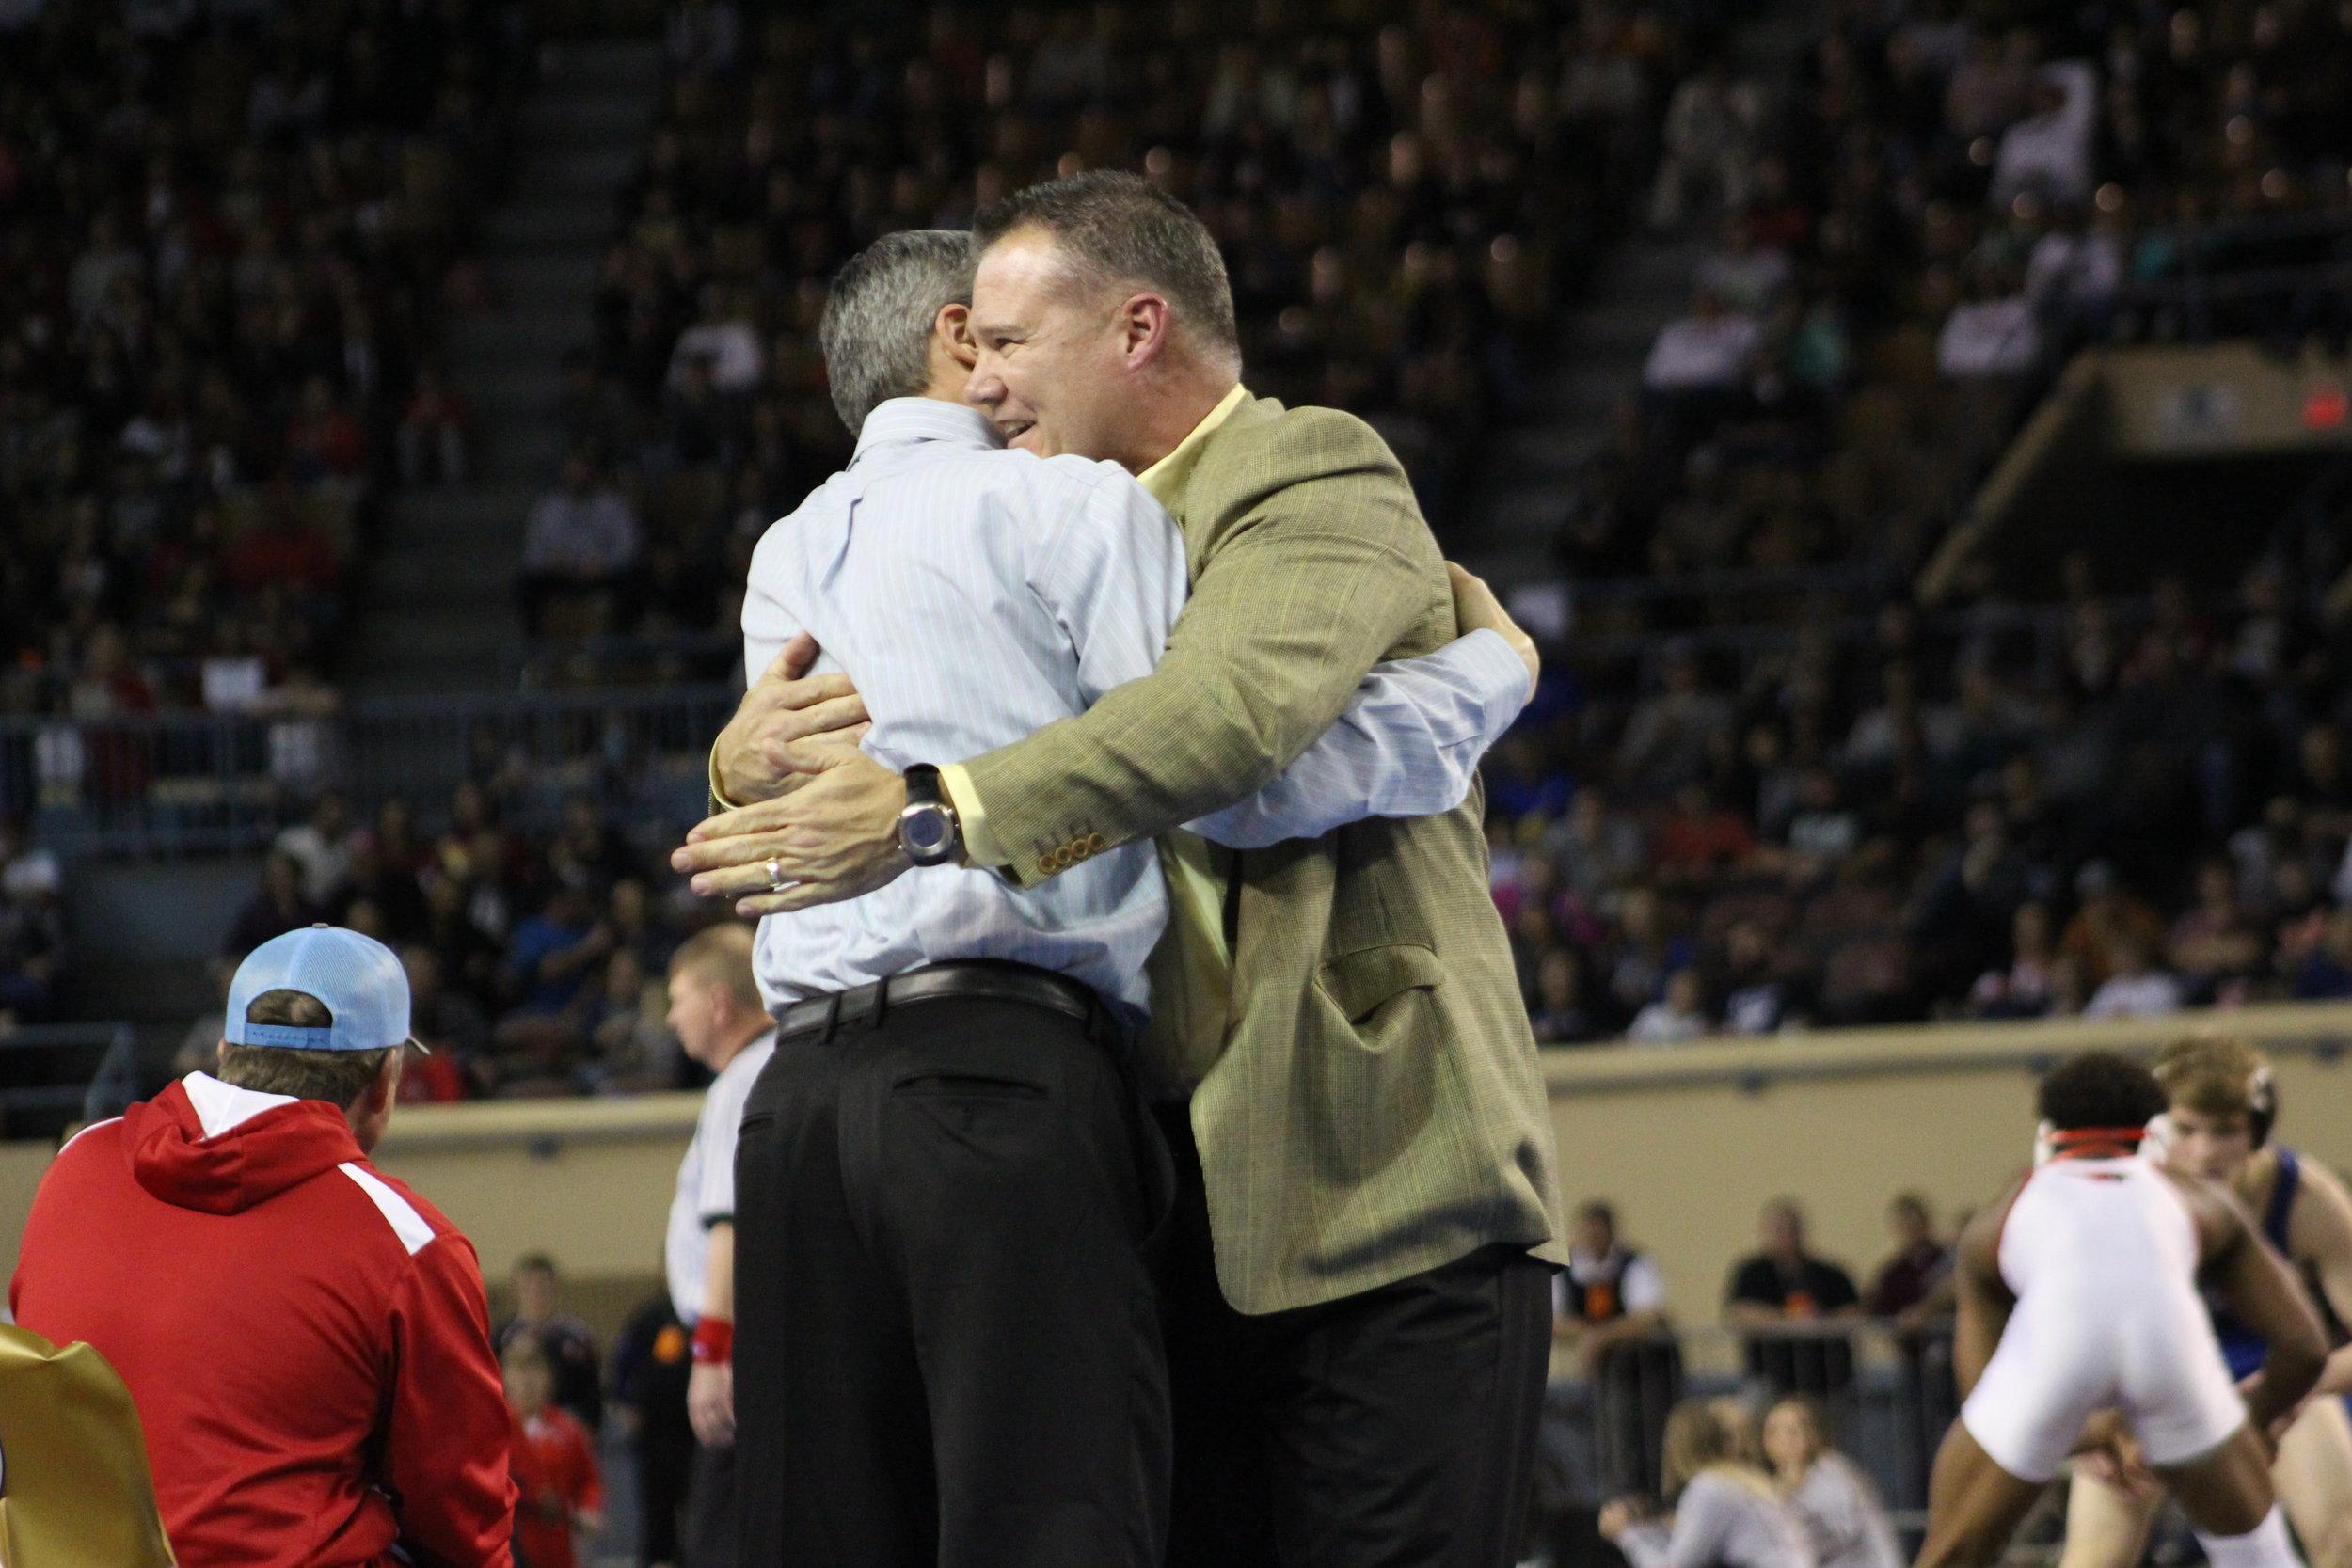 Coaches Kelly Smith and Derek Fix celebrate Daton Fix's State Championship win.